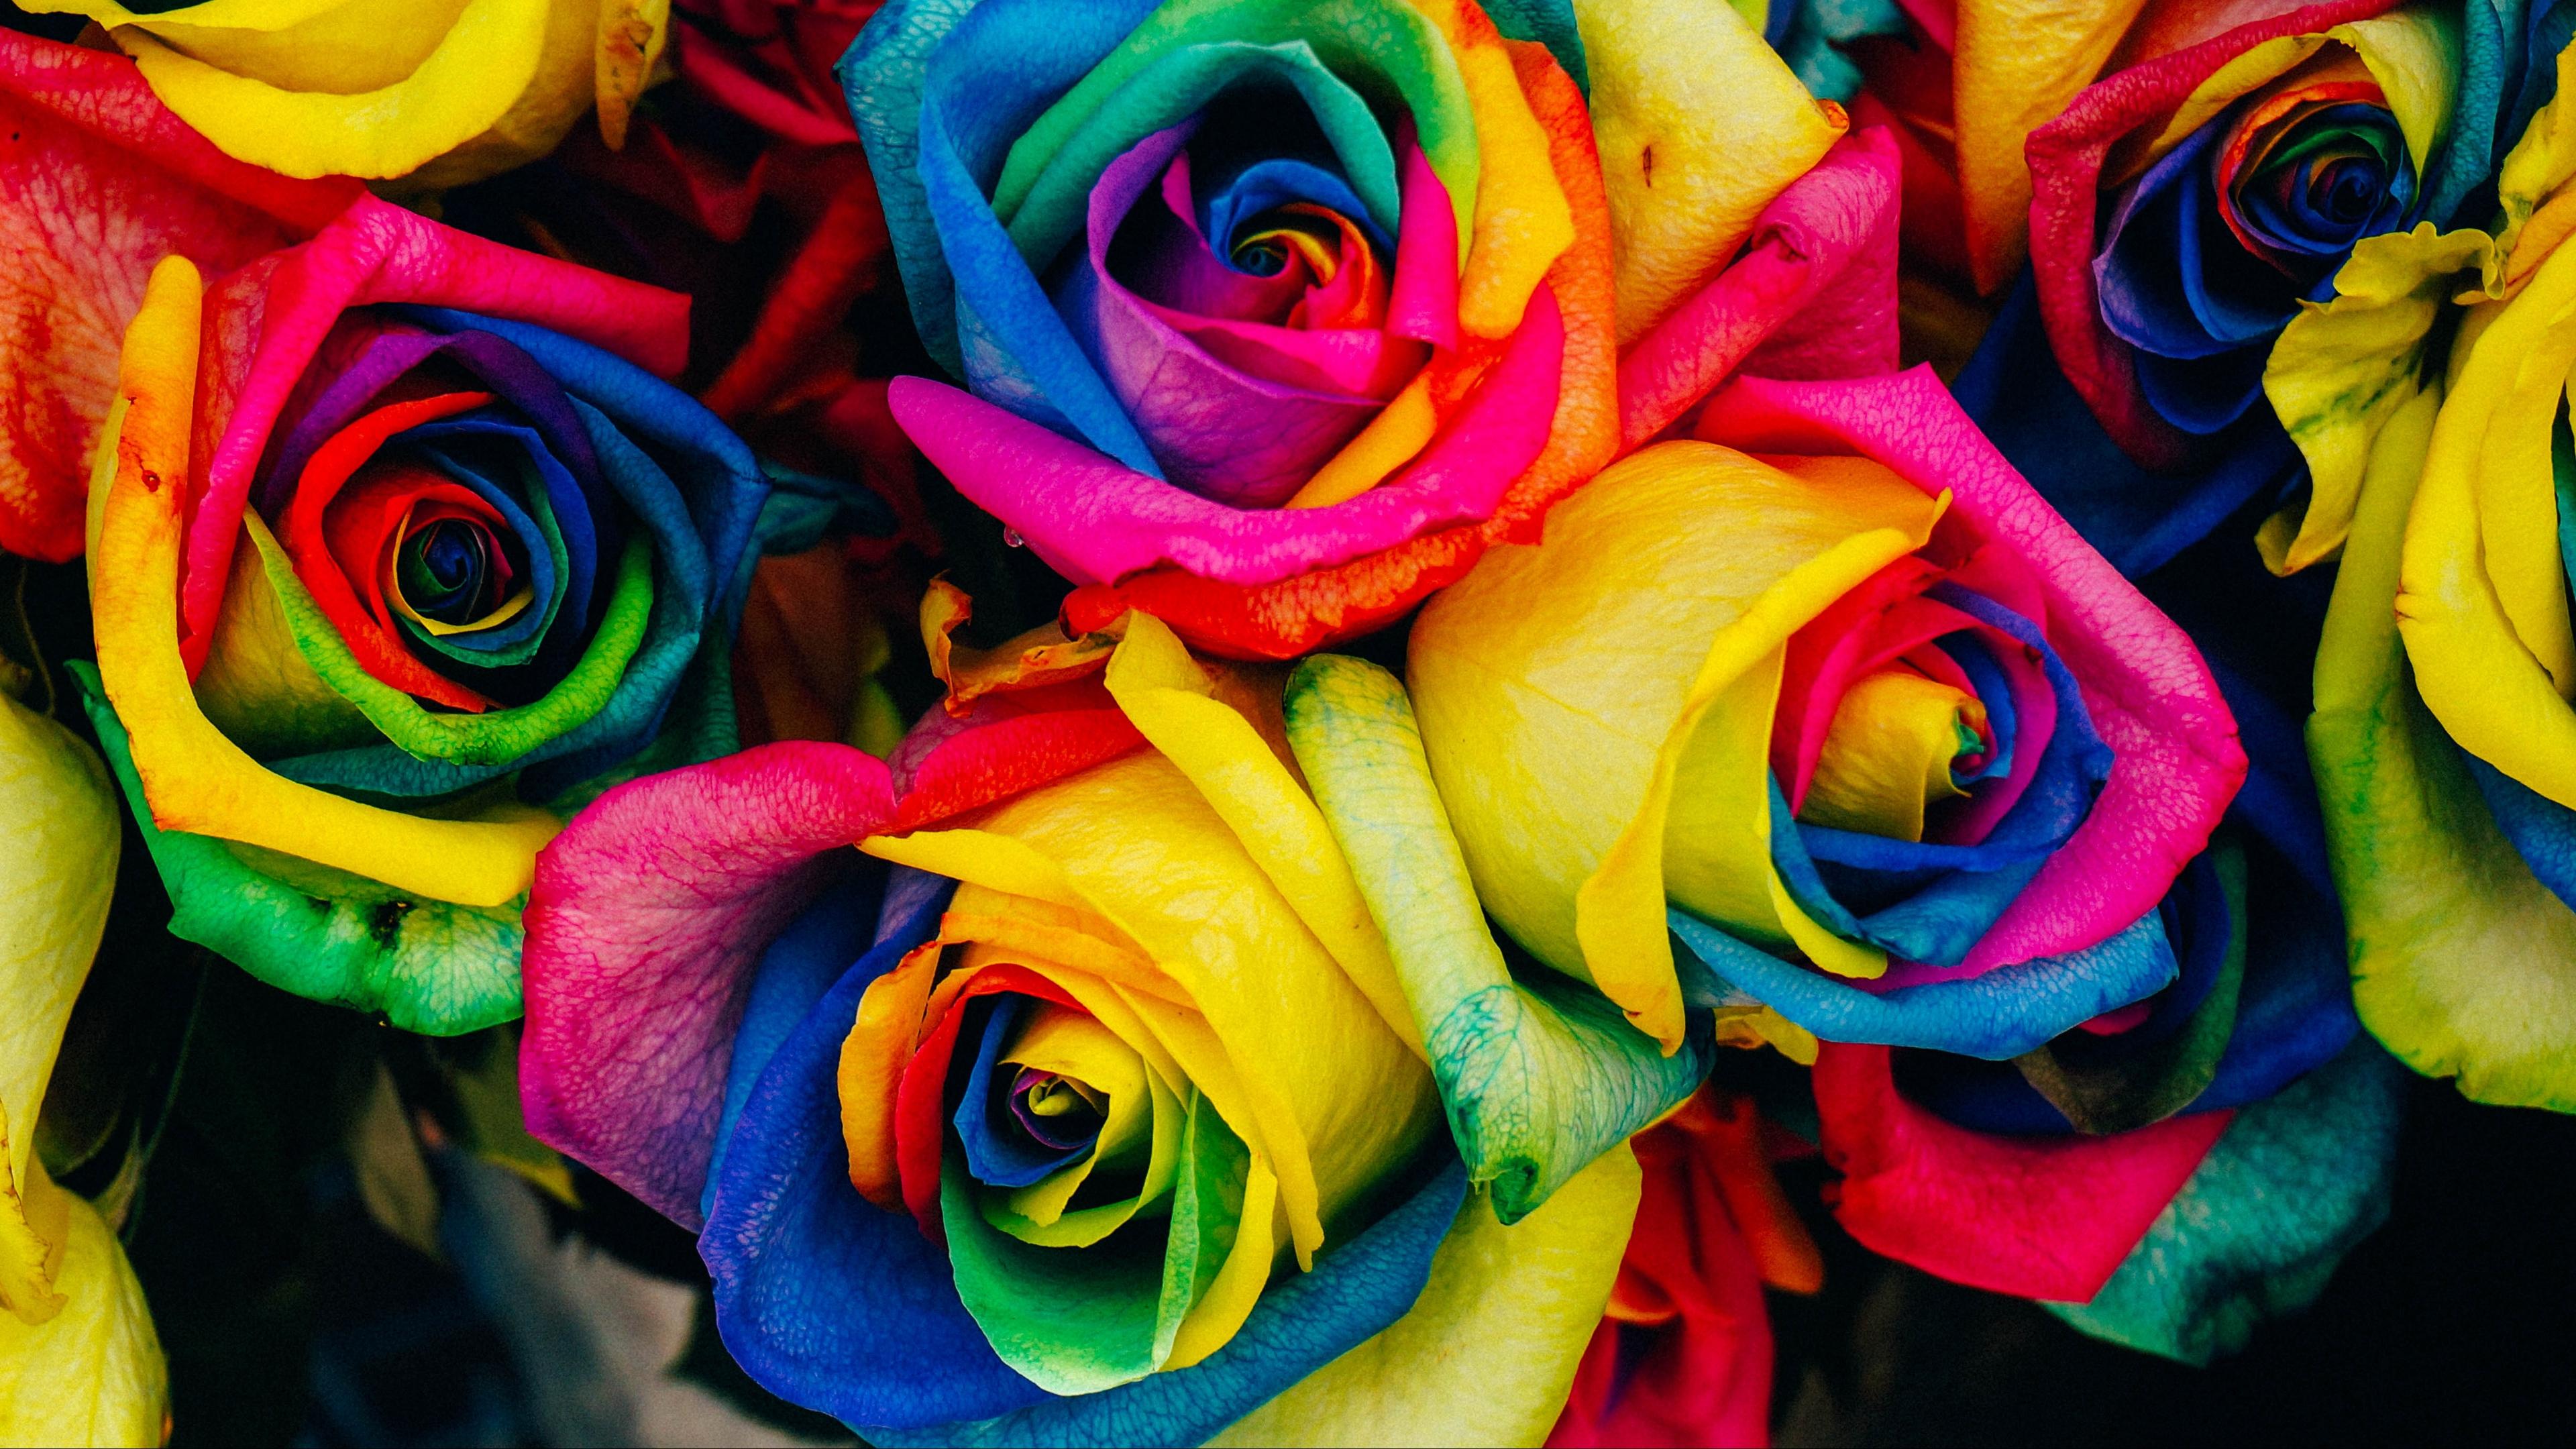 roses colorful rainbow 4k 1540064948 - roses, colorful, rainbow 4k - Roses, rainbow, Colorful